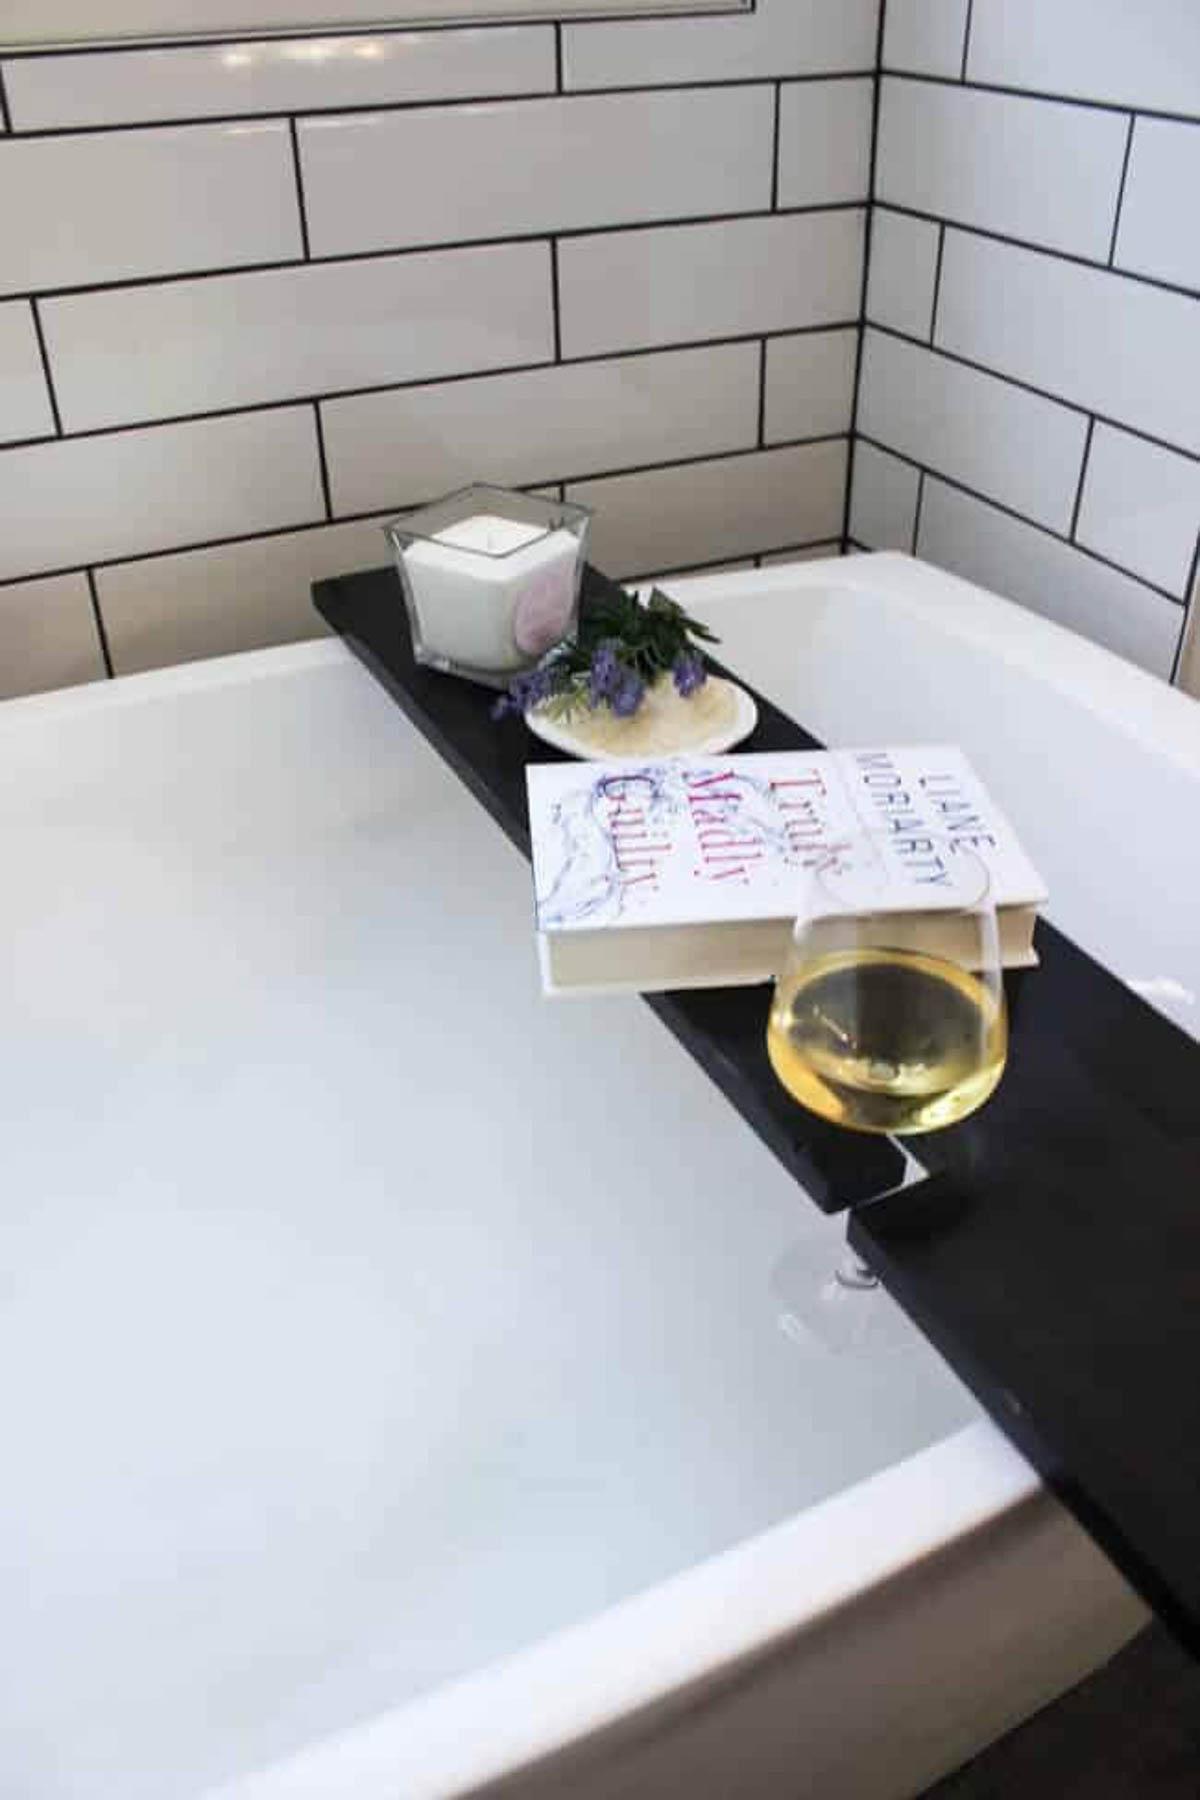 Overhead image of DIY bath tray